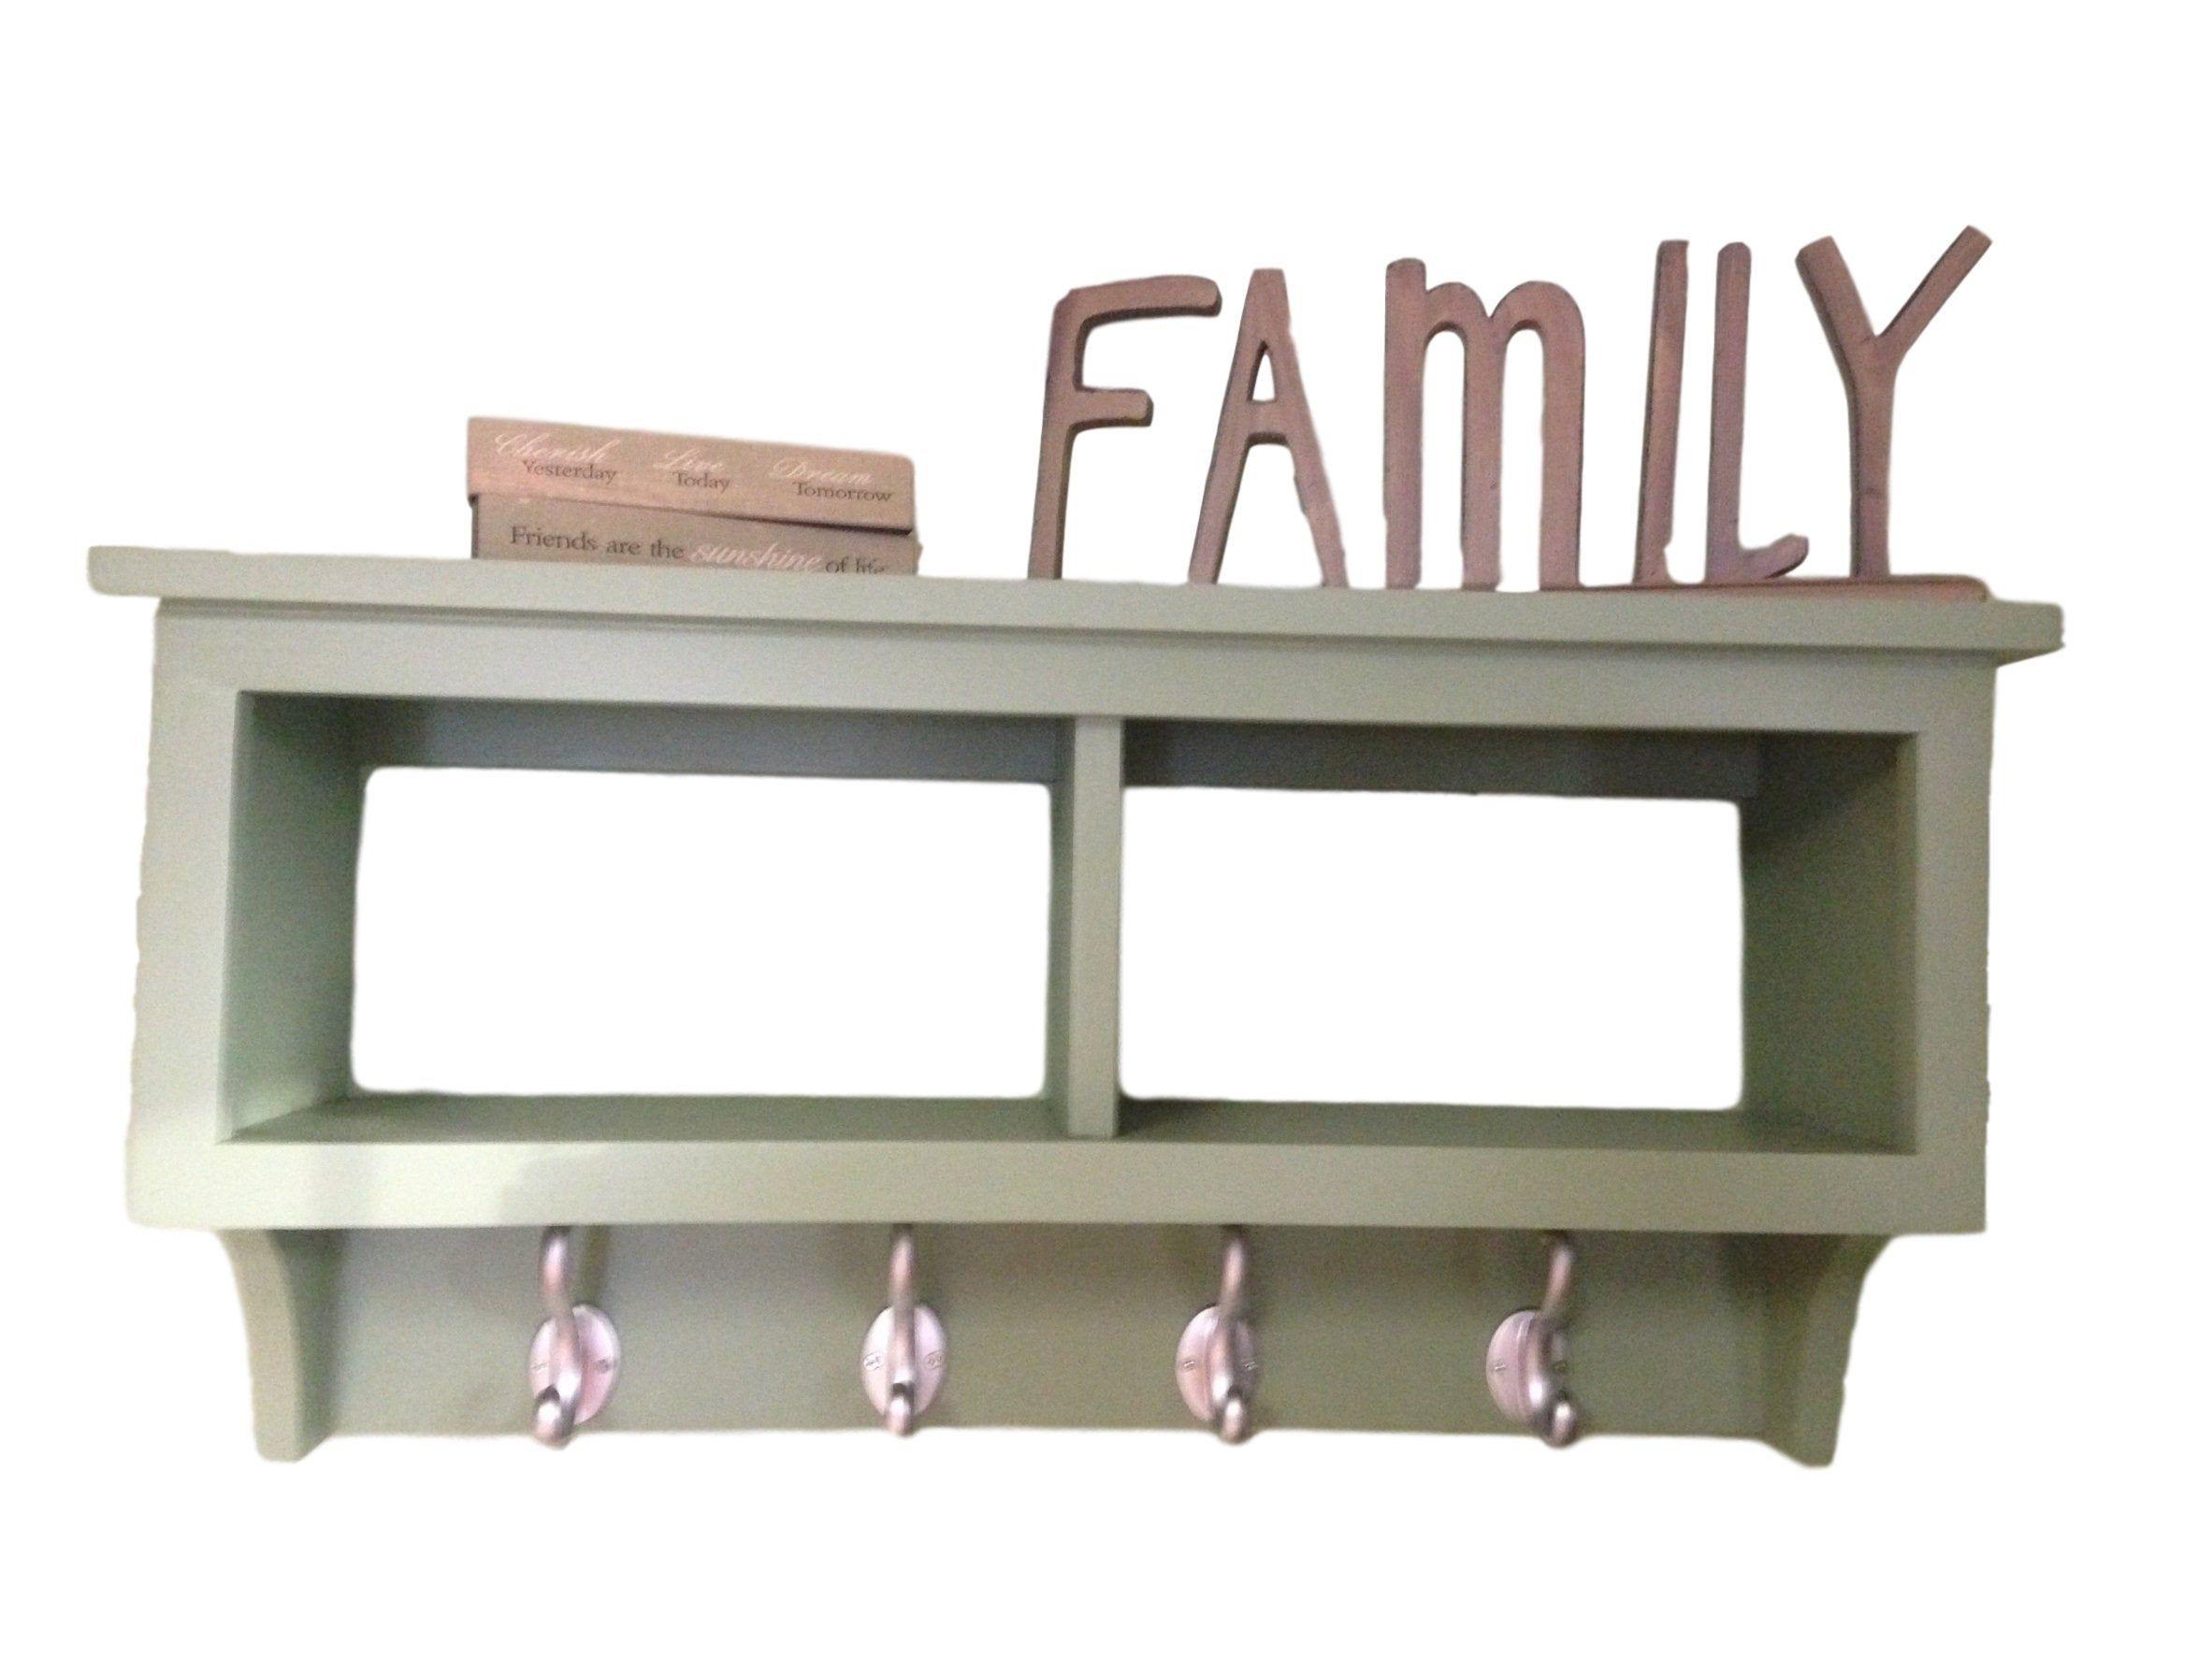 2 Cubby Wall Shelf Country Shelf For Baskets Bath Or Entryway Etsy Country Shelves Wall Shelves Cubbies